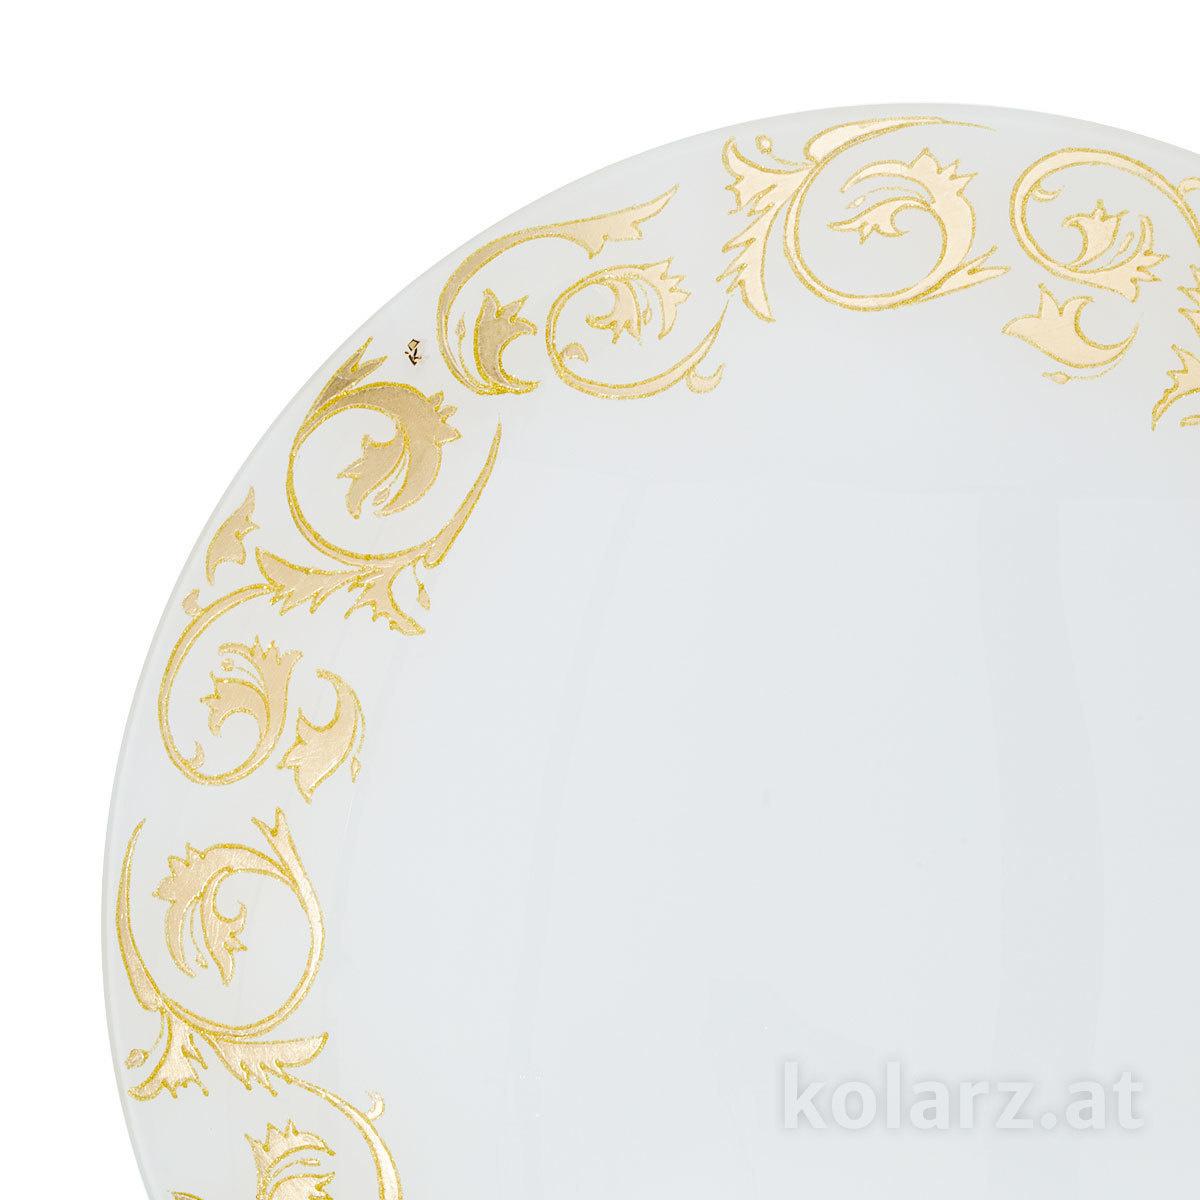 deckenleuchte serena toscana gold white 40 24 karat. Black Bedroom Furniture Sets. Home Design Ideas